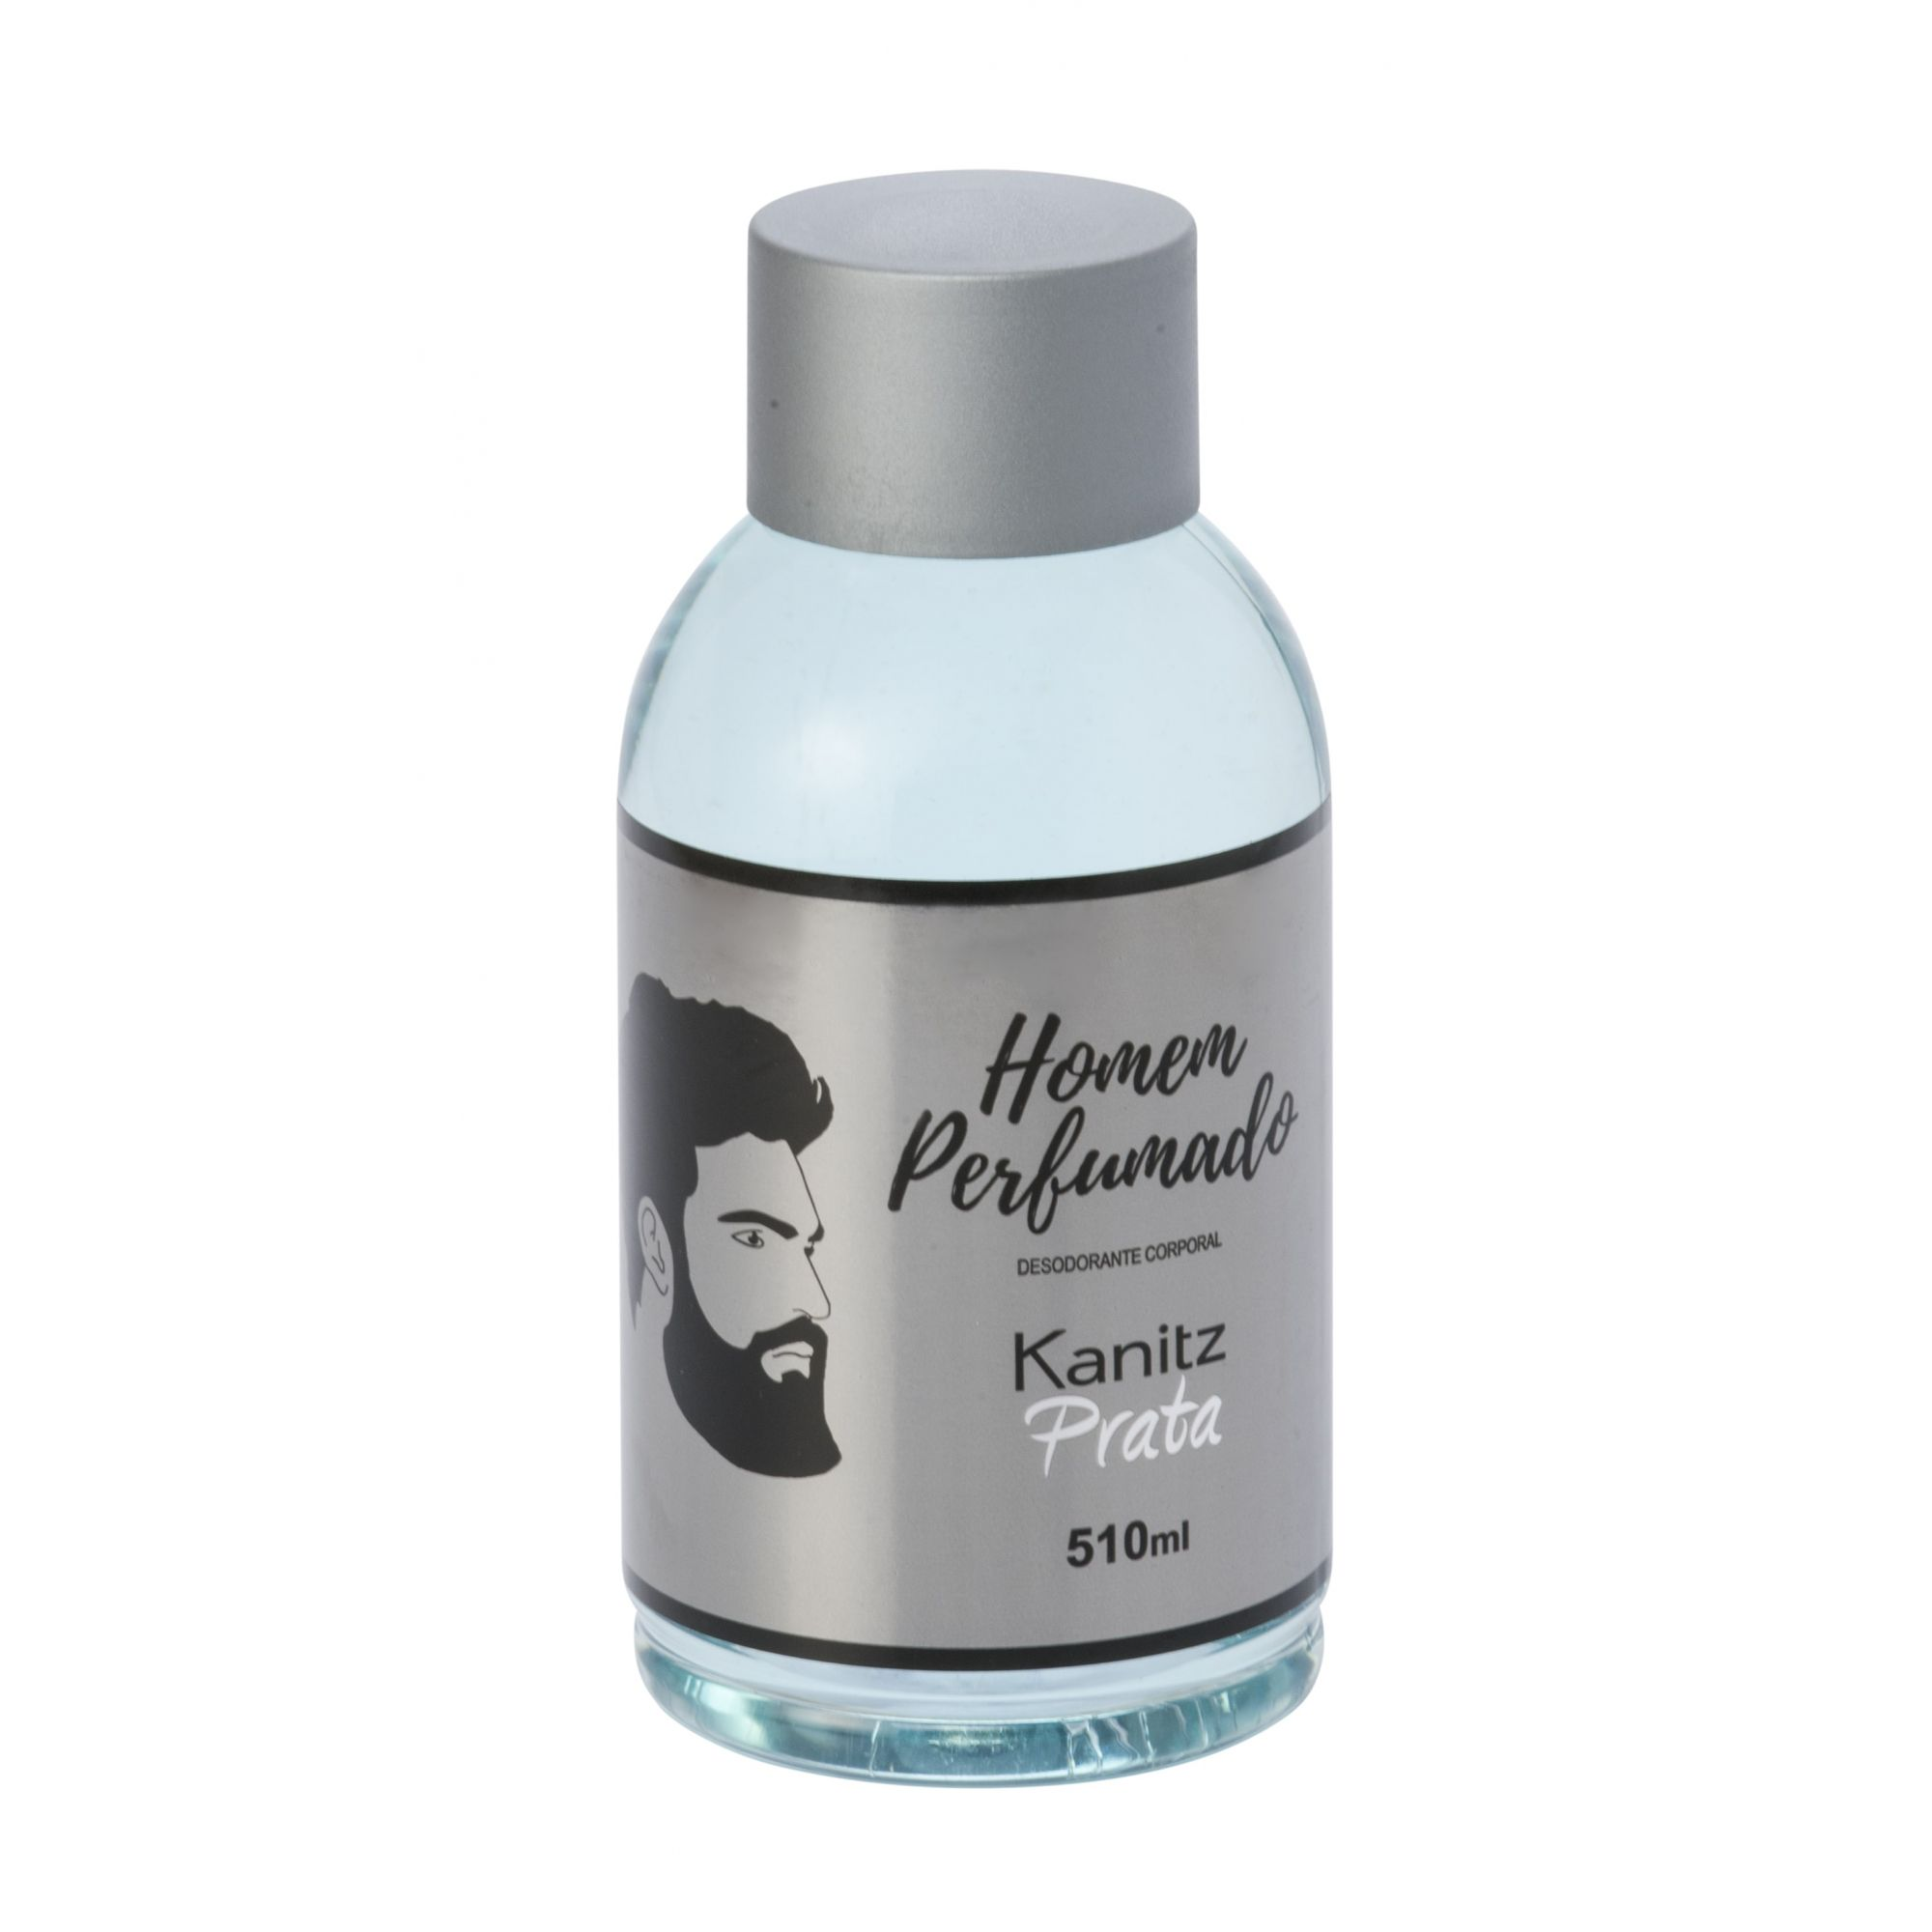 Deo Colônia Kanitz Prata Homem Perfumado 510ml